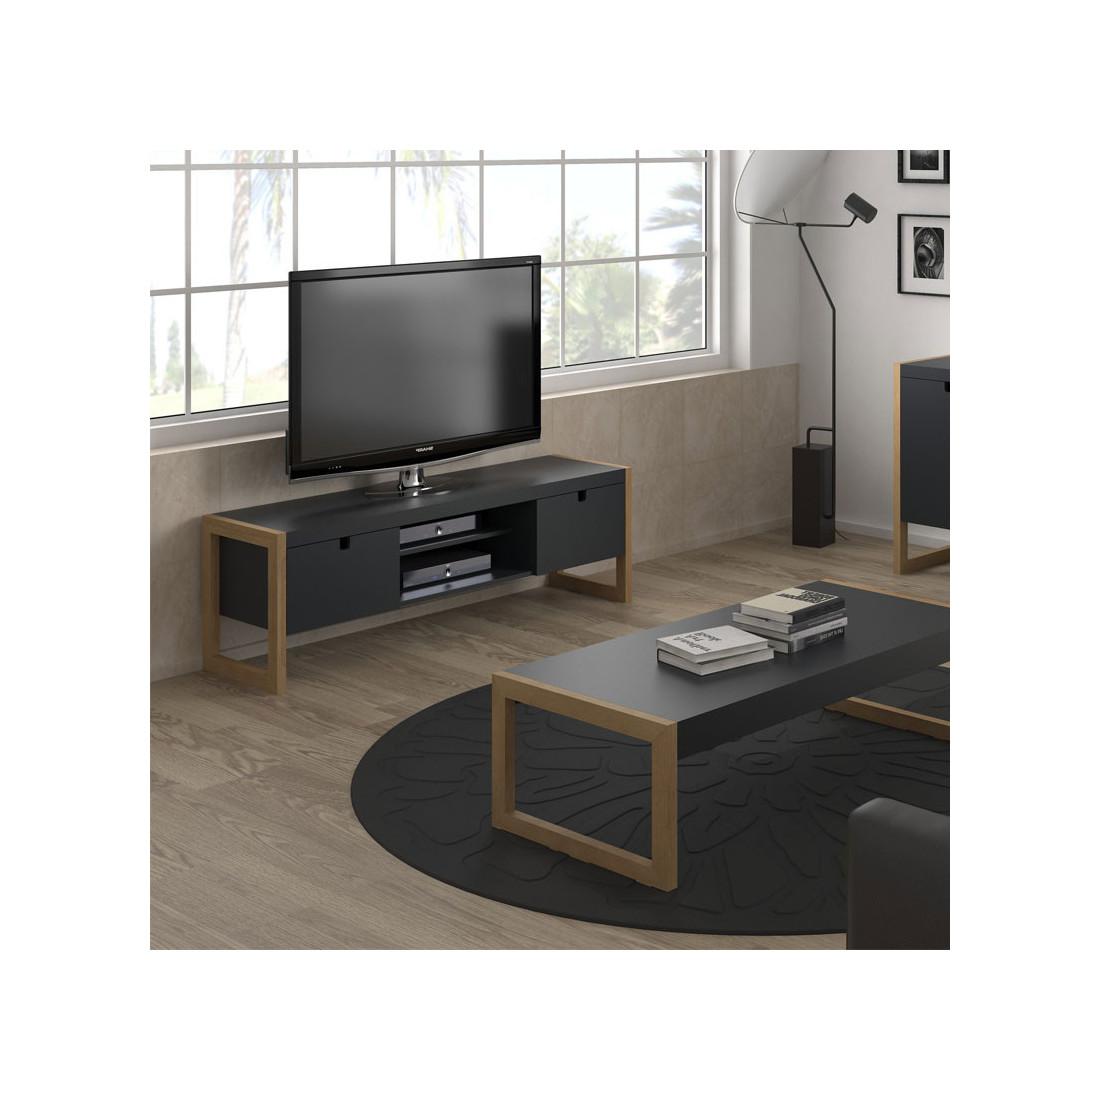 Meuble Tv 2 Portes Gris Anthracite Chene Odile Univers Du